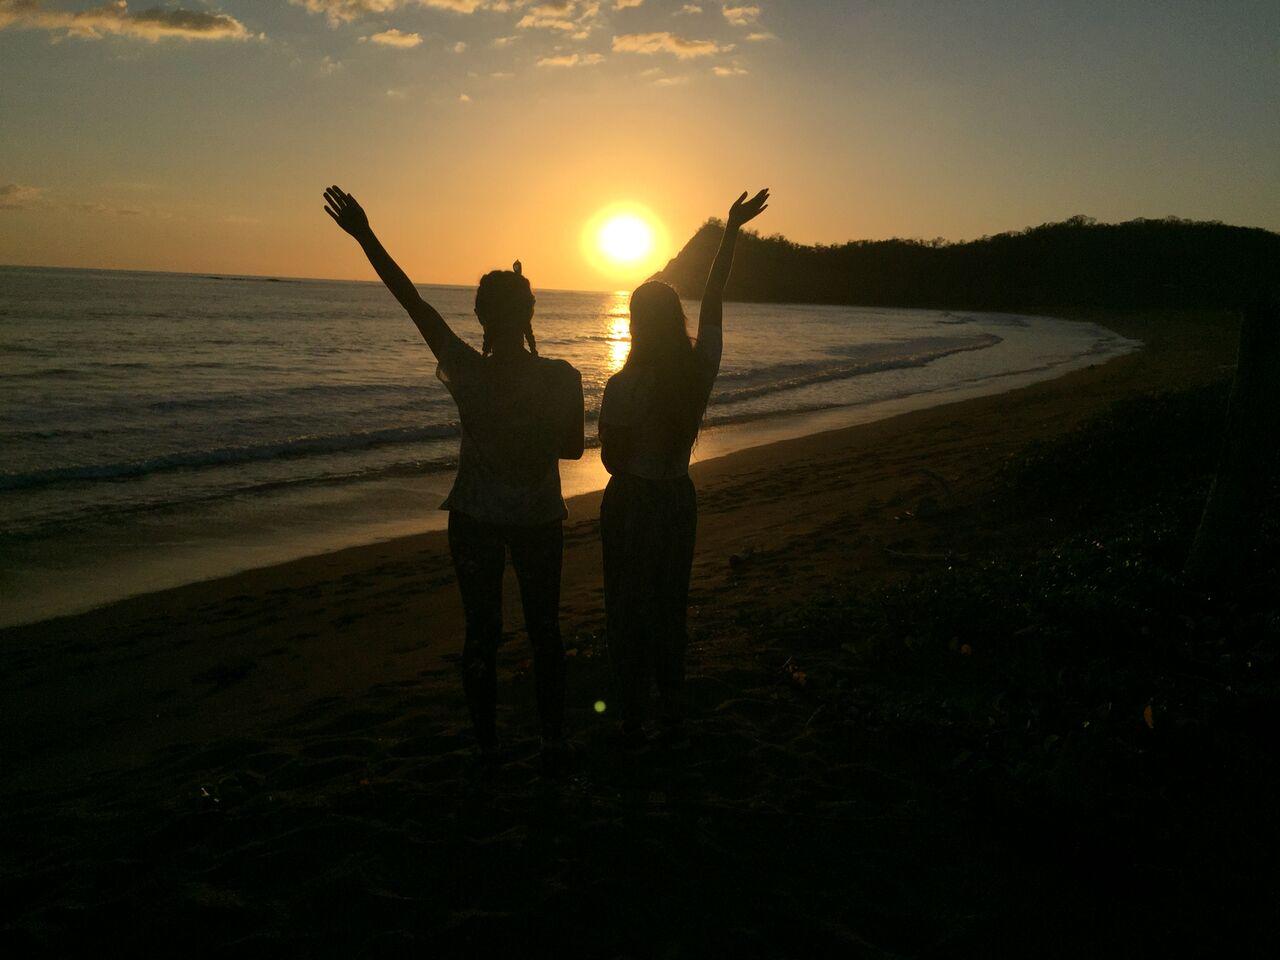 sunset bestfriends